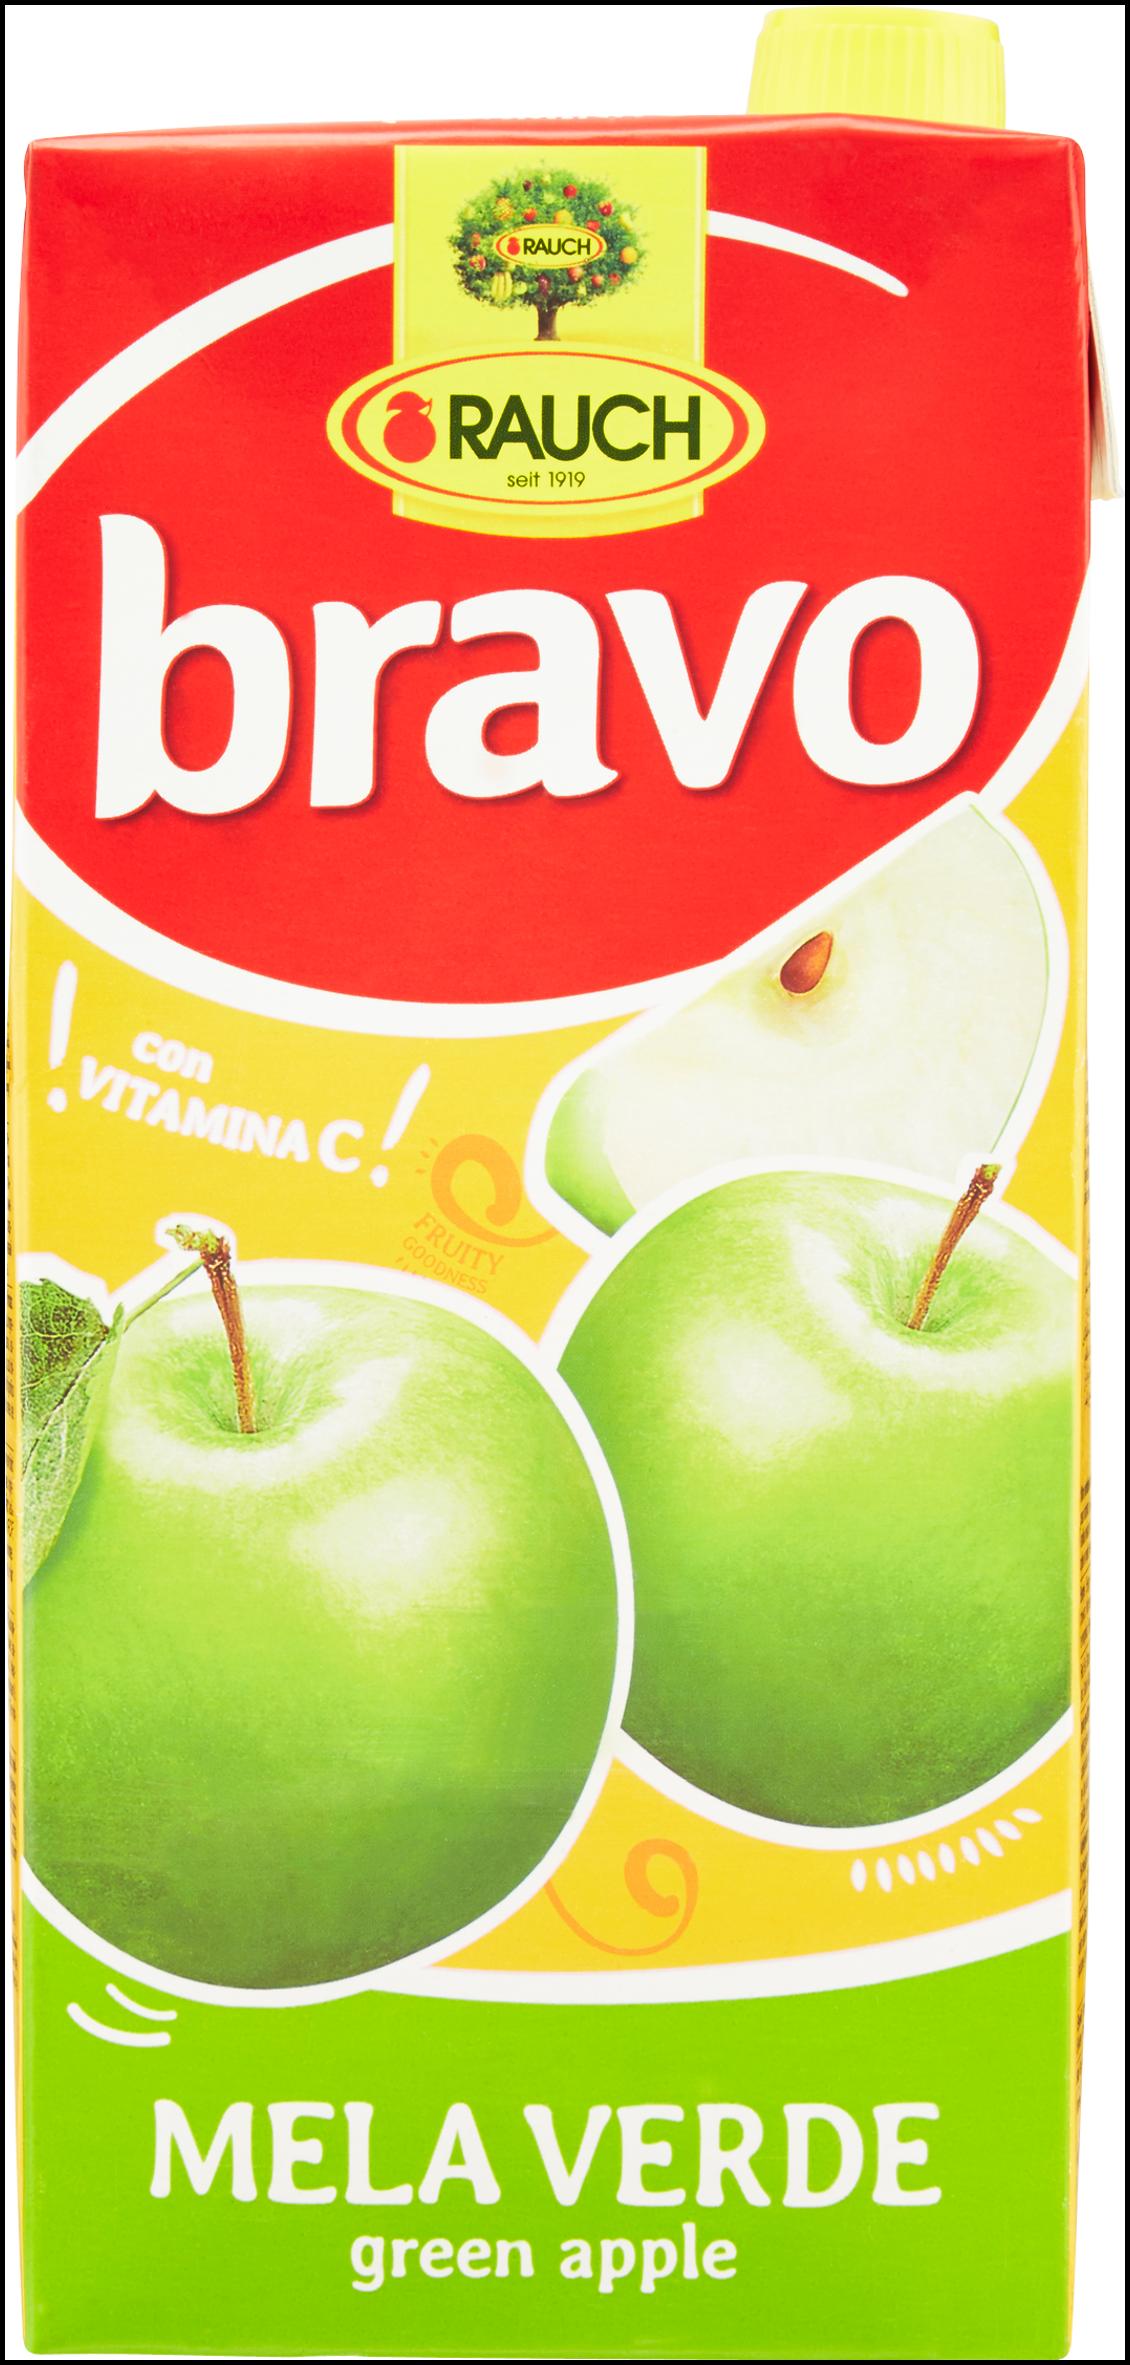 BEVANDA BRAVO RAUCH 2L MELA VERDE